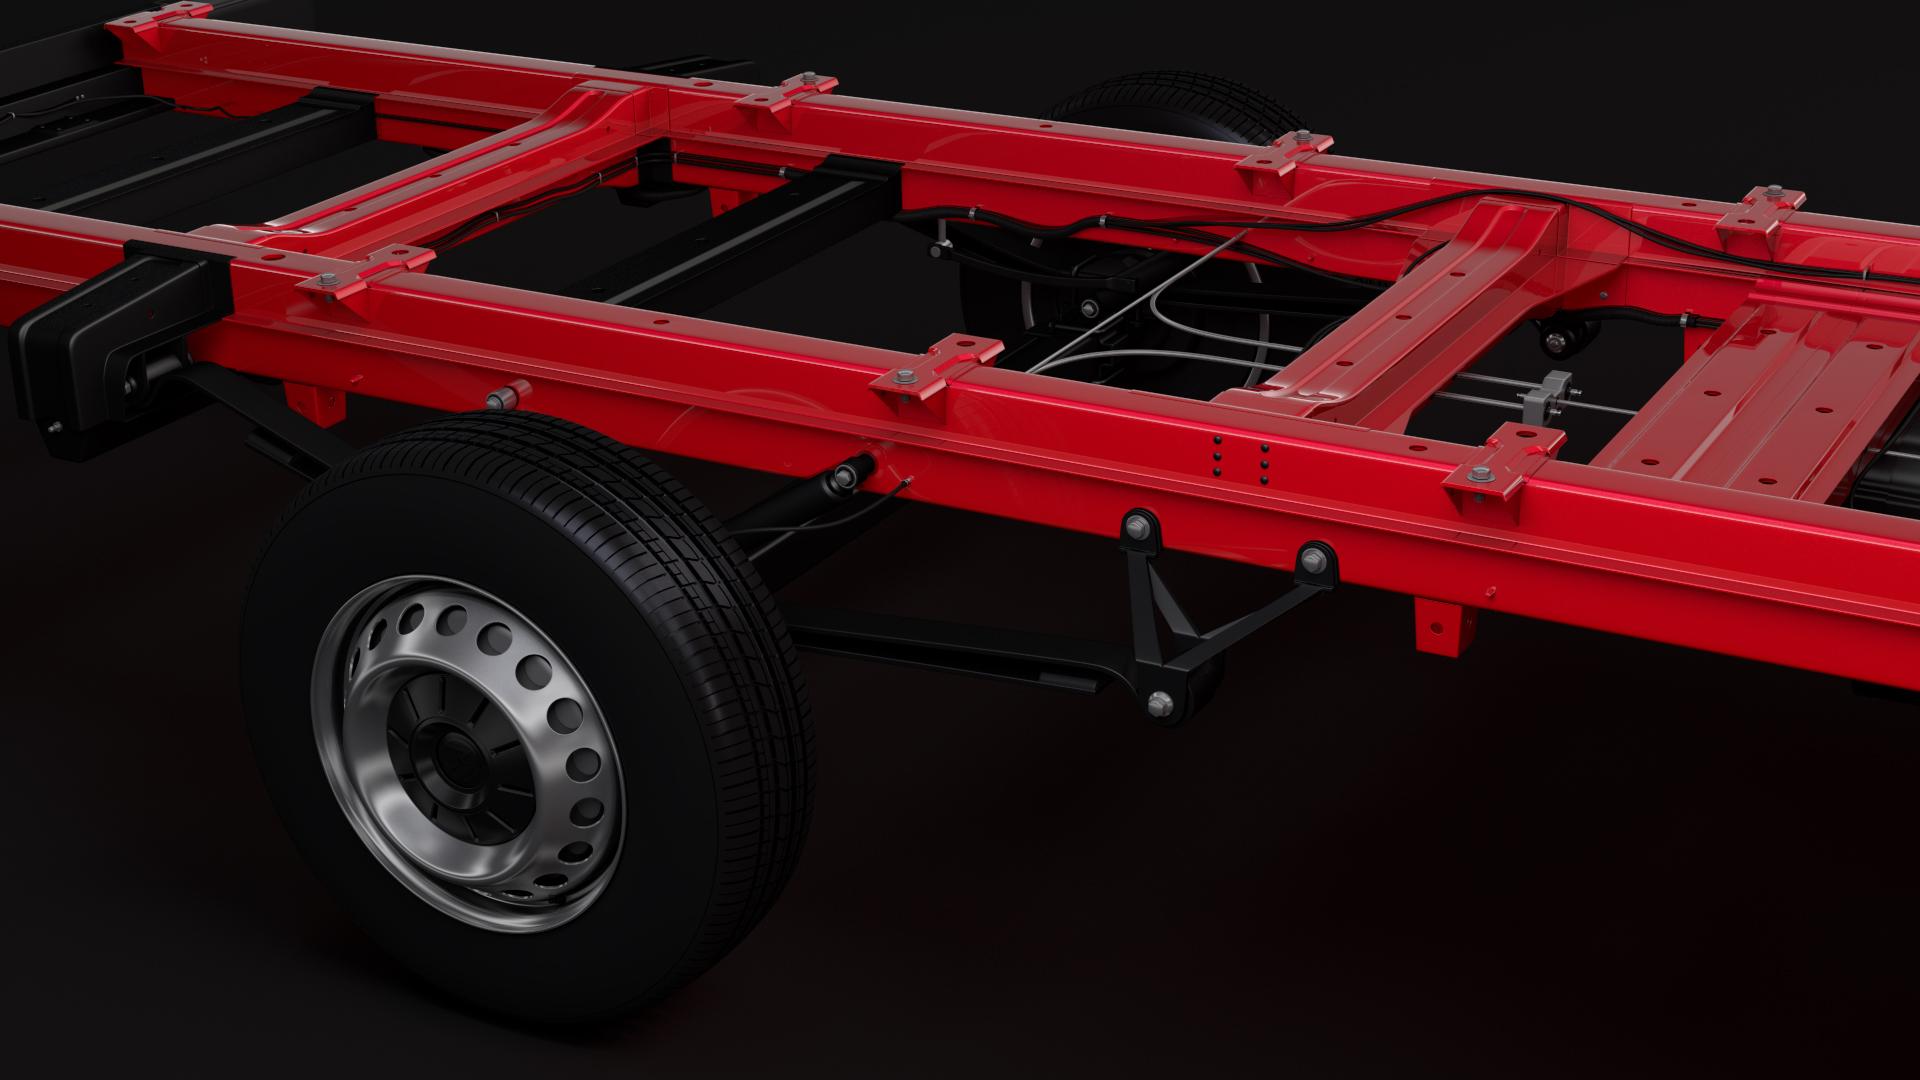 vw crafter chassi doublecab l3 2017 3d model max fbx c4d lwo ma mb hrc xsi obj 274710